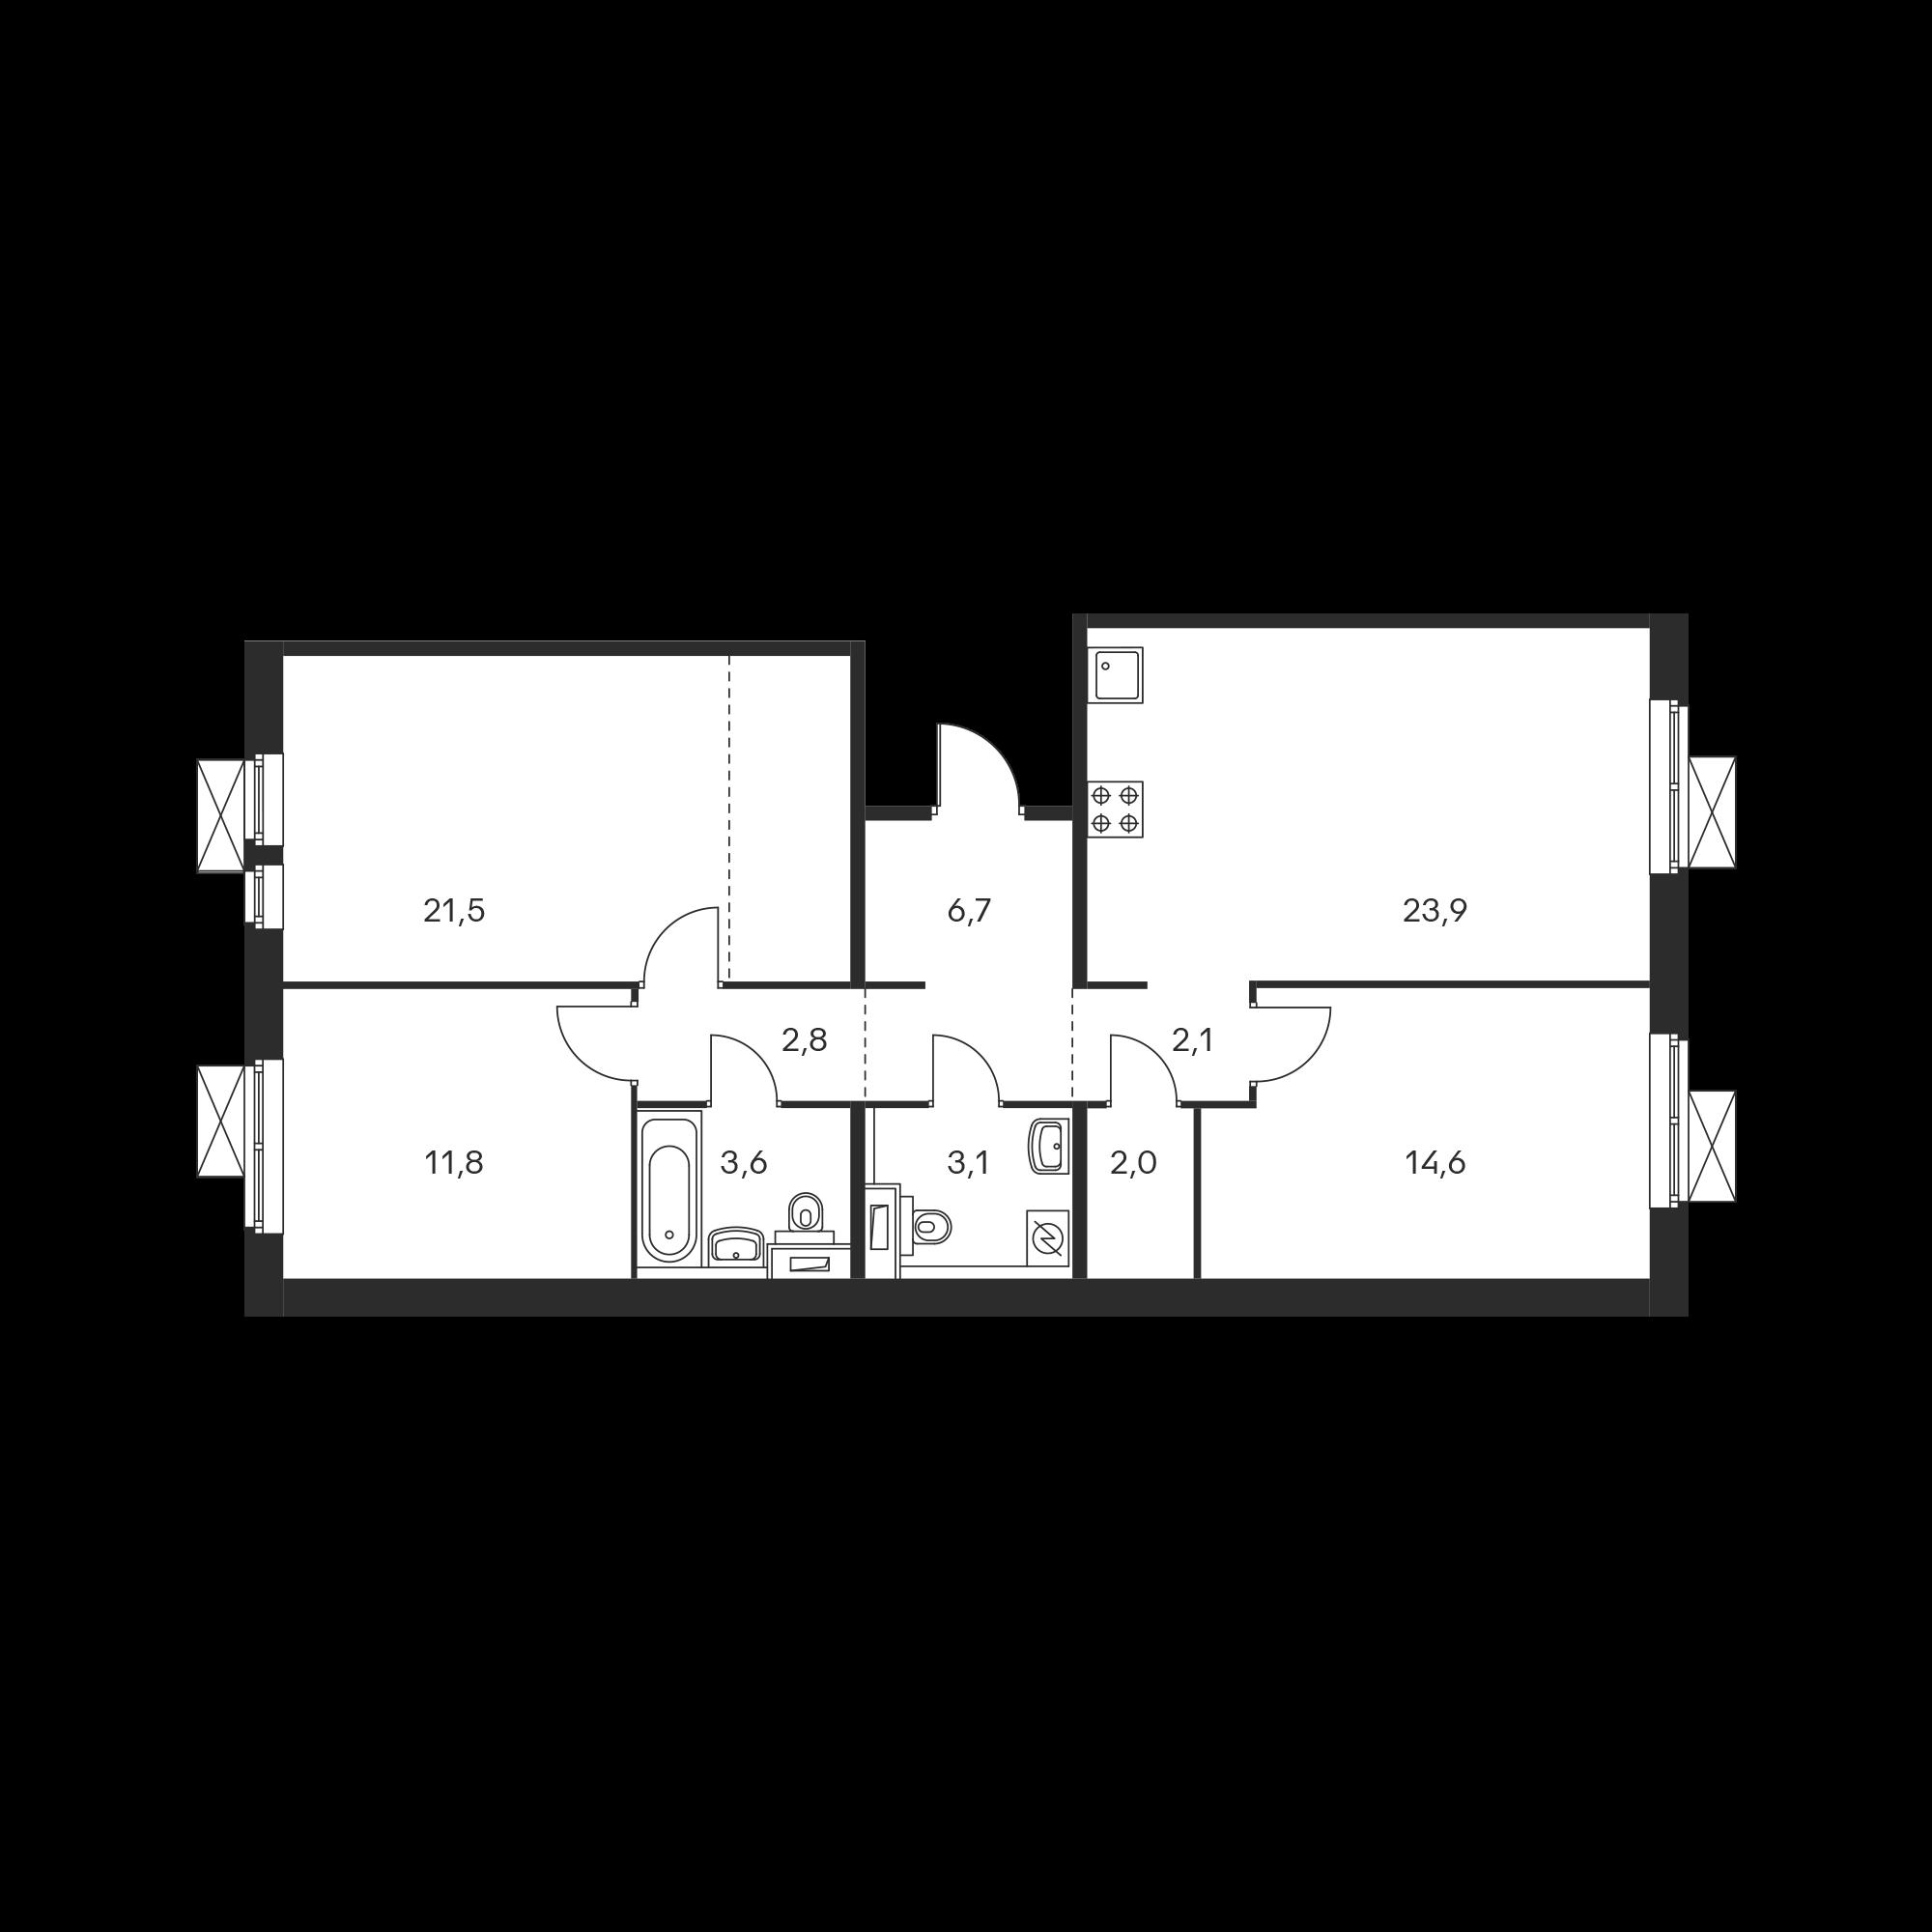 3EL5_7.2-2